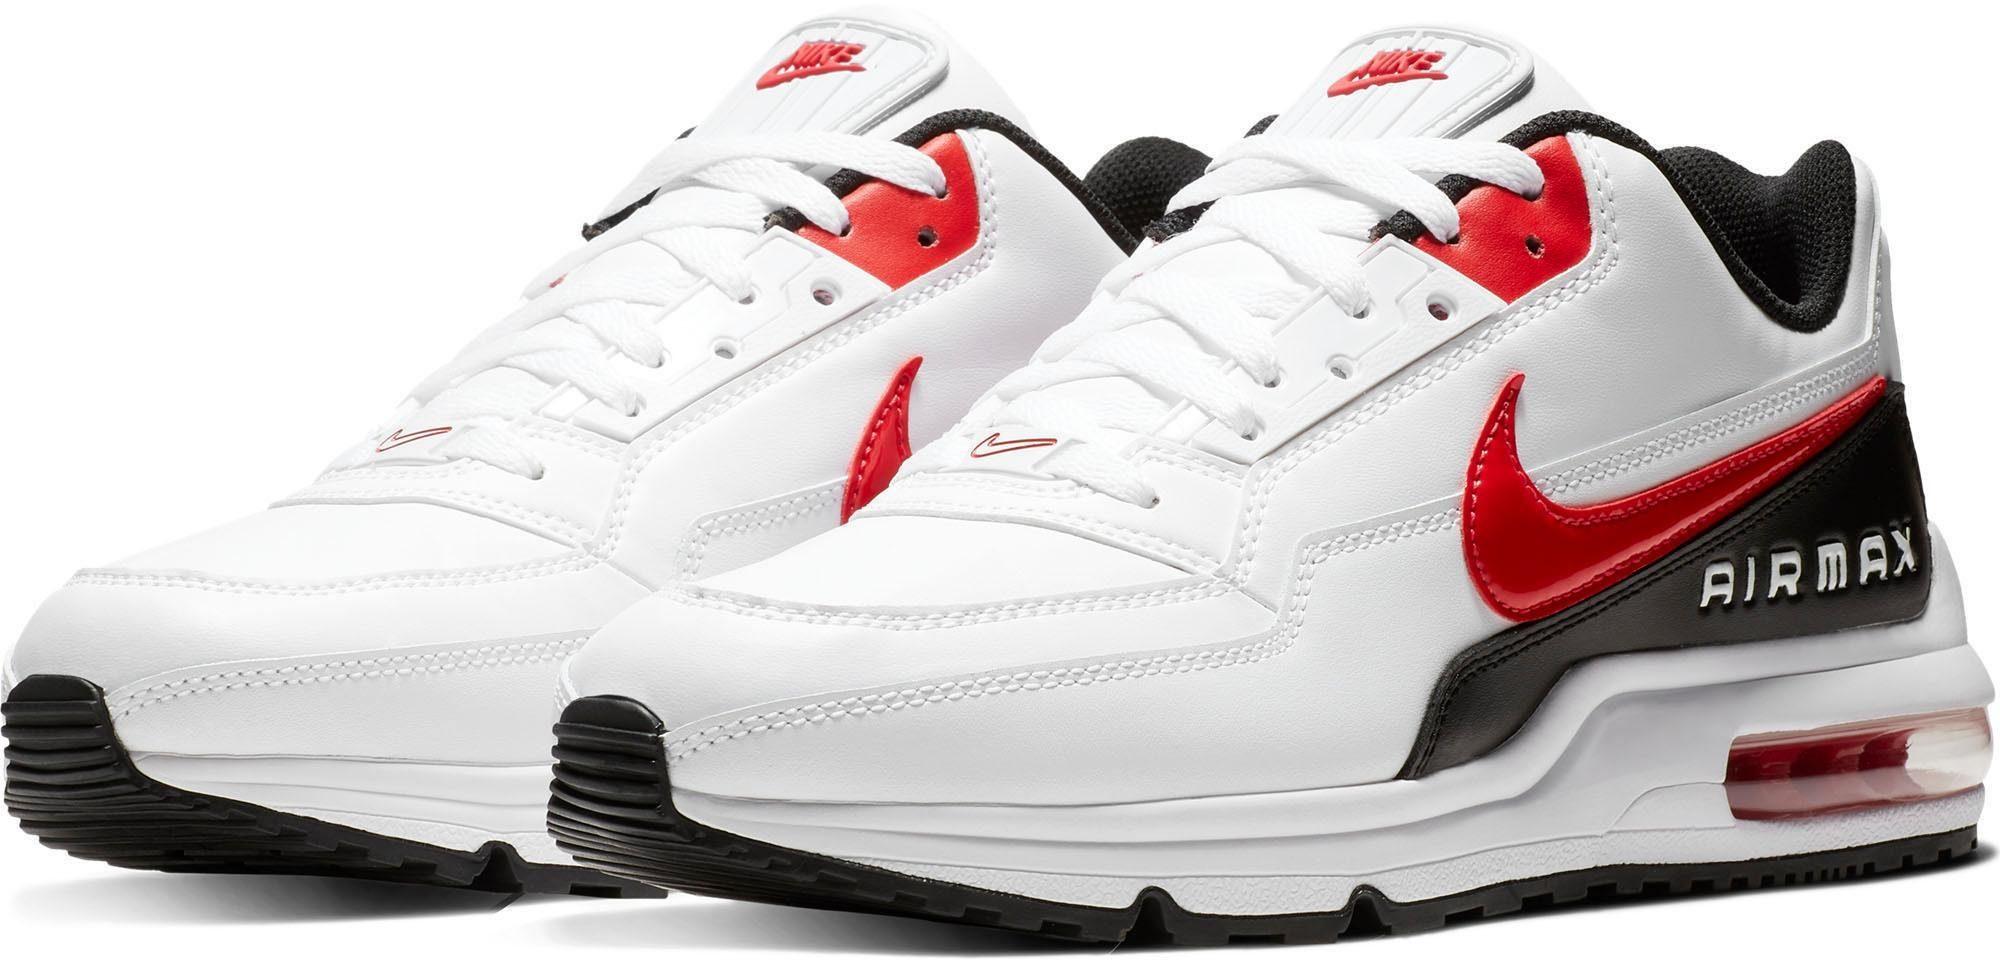 Nike Sportswear »Air Max 1« Sneaker online kaufen | OTTO